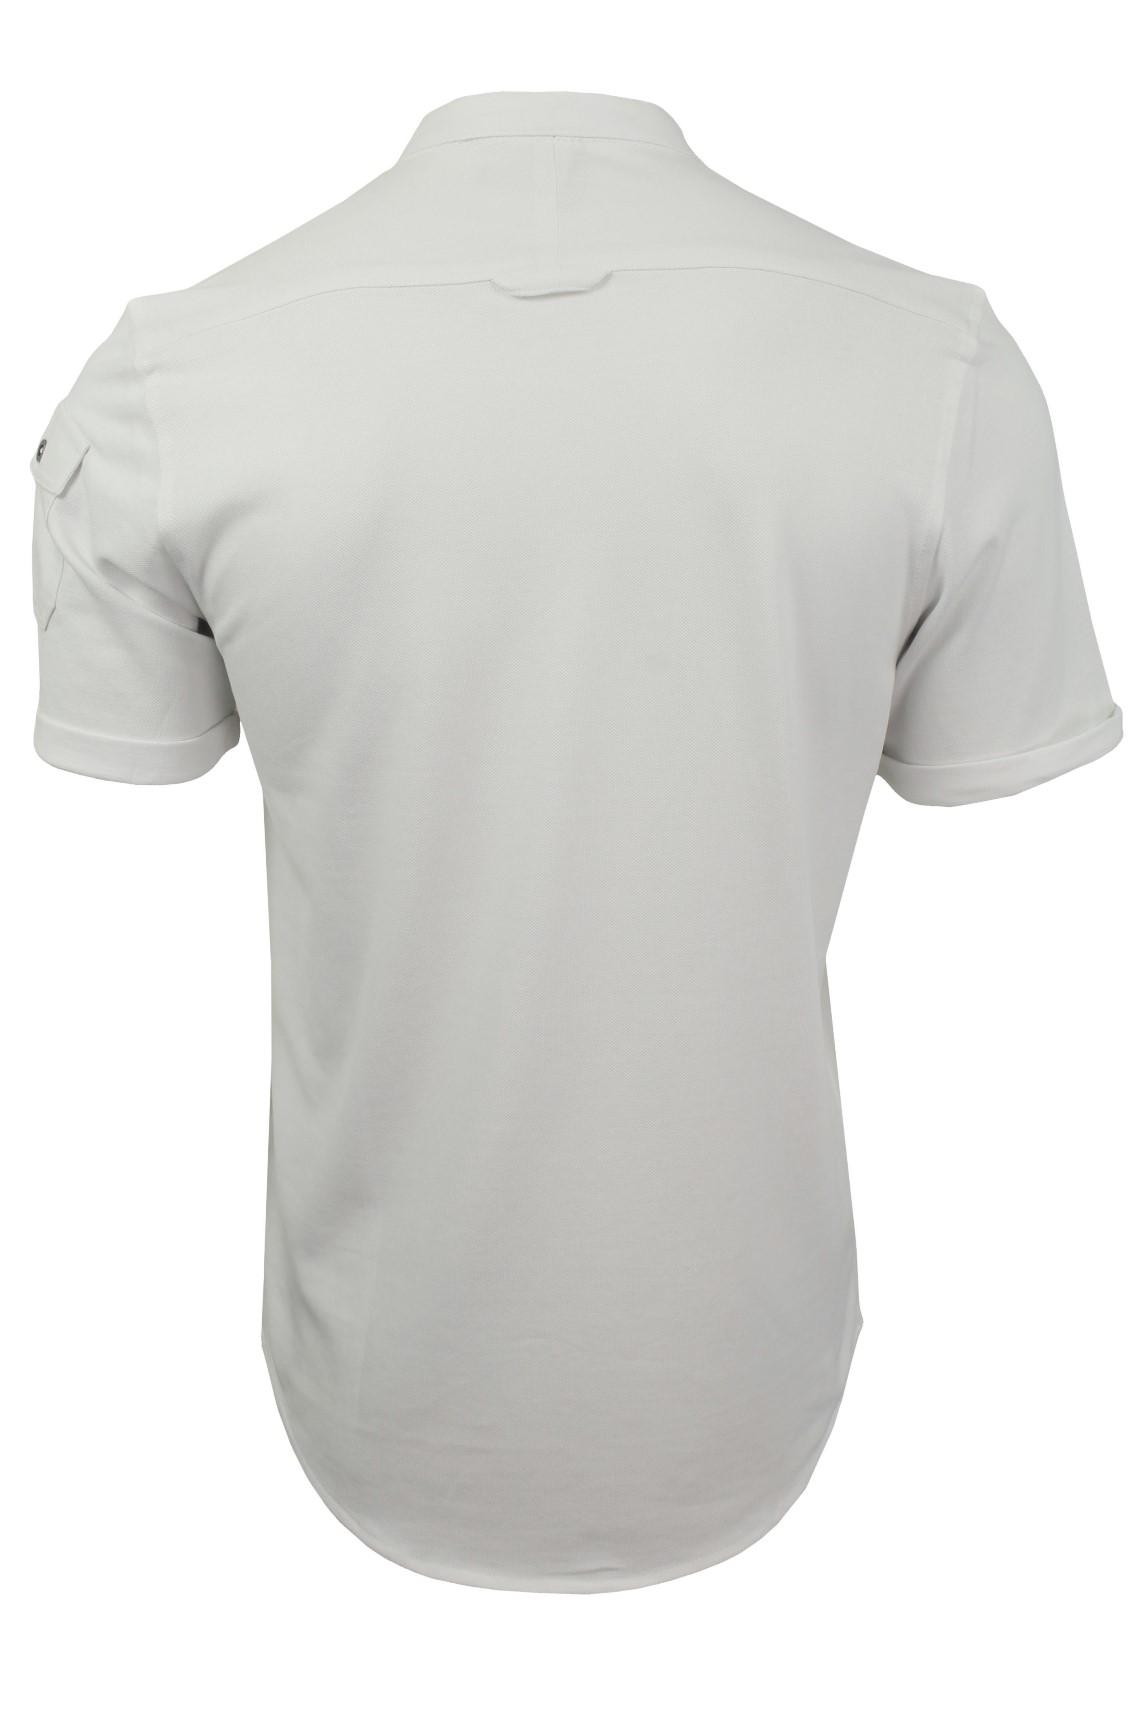 Mens-Grandad-Collar-Pique-Shirt-by-Brave-Soul-039-Joey-039 thumbnail 14